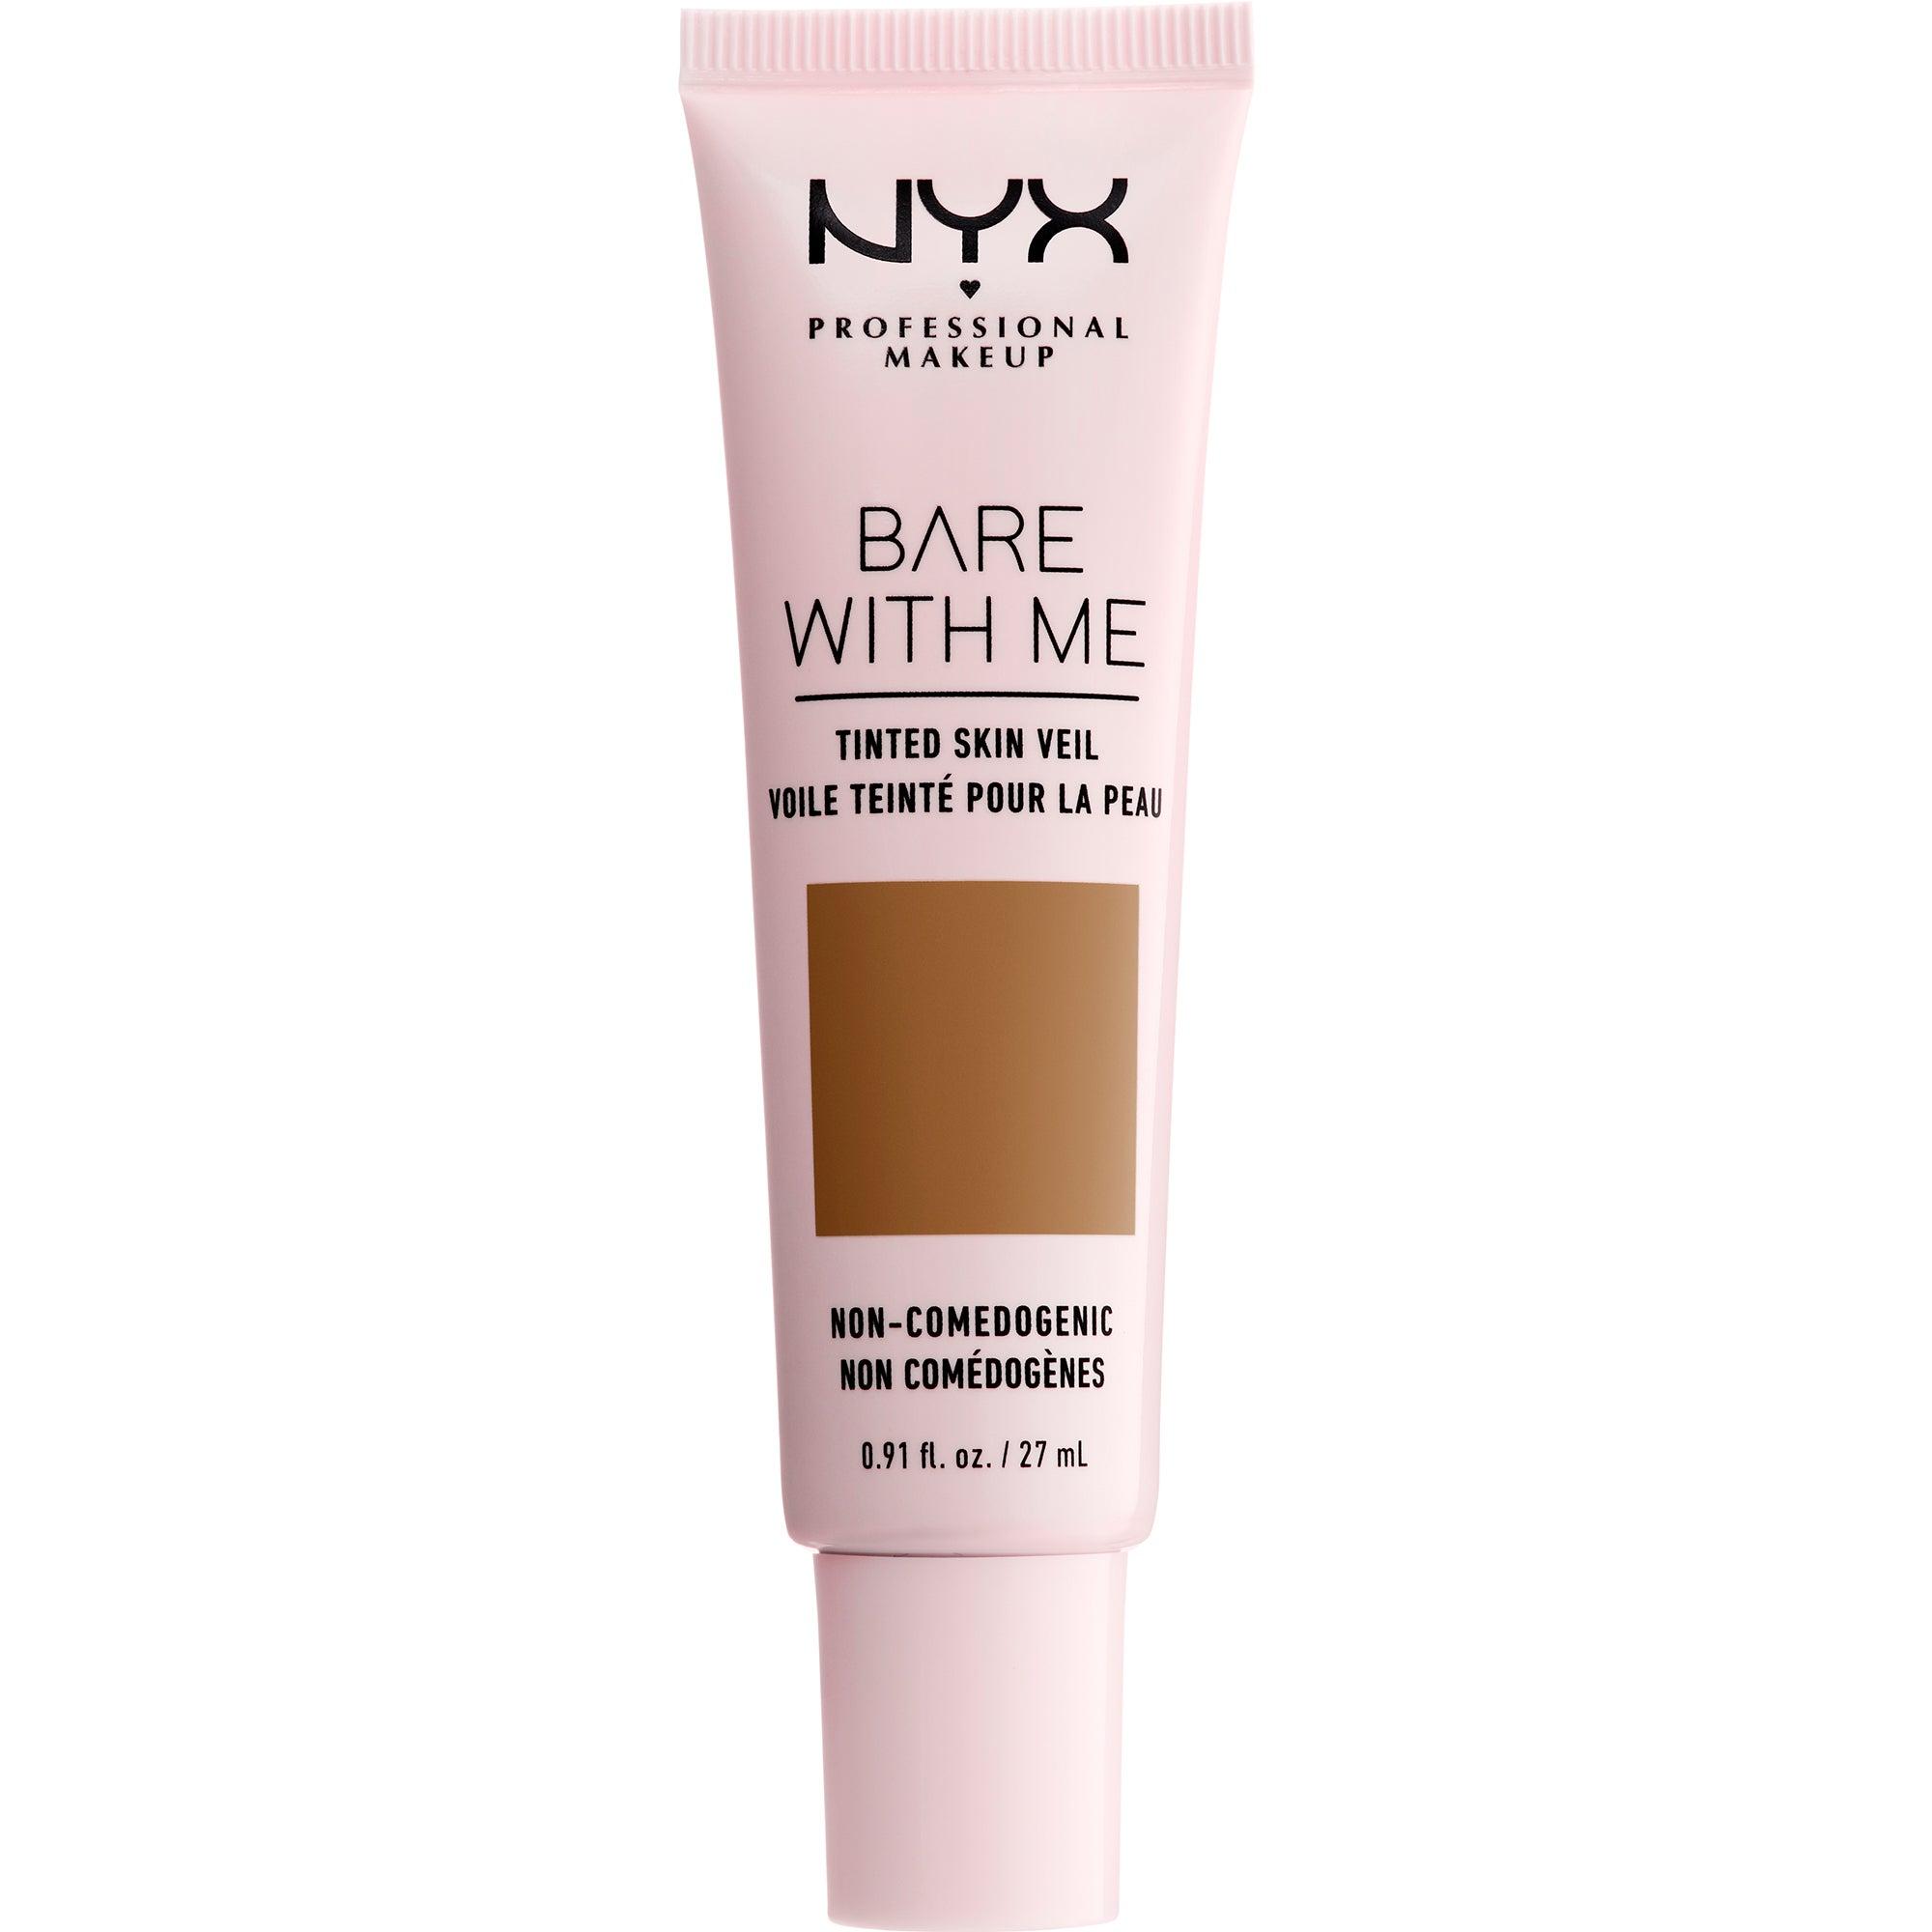 NYX PROF. MAKEUP Bare With Me Tinted Skin Veil - Cinnamon Mahagony